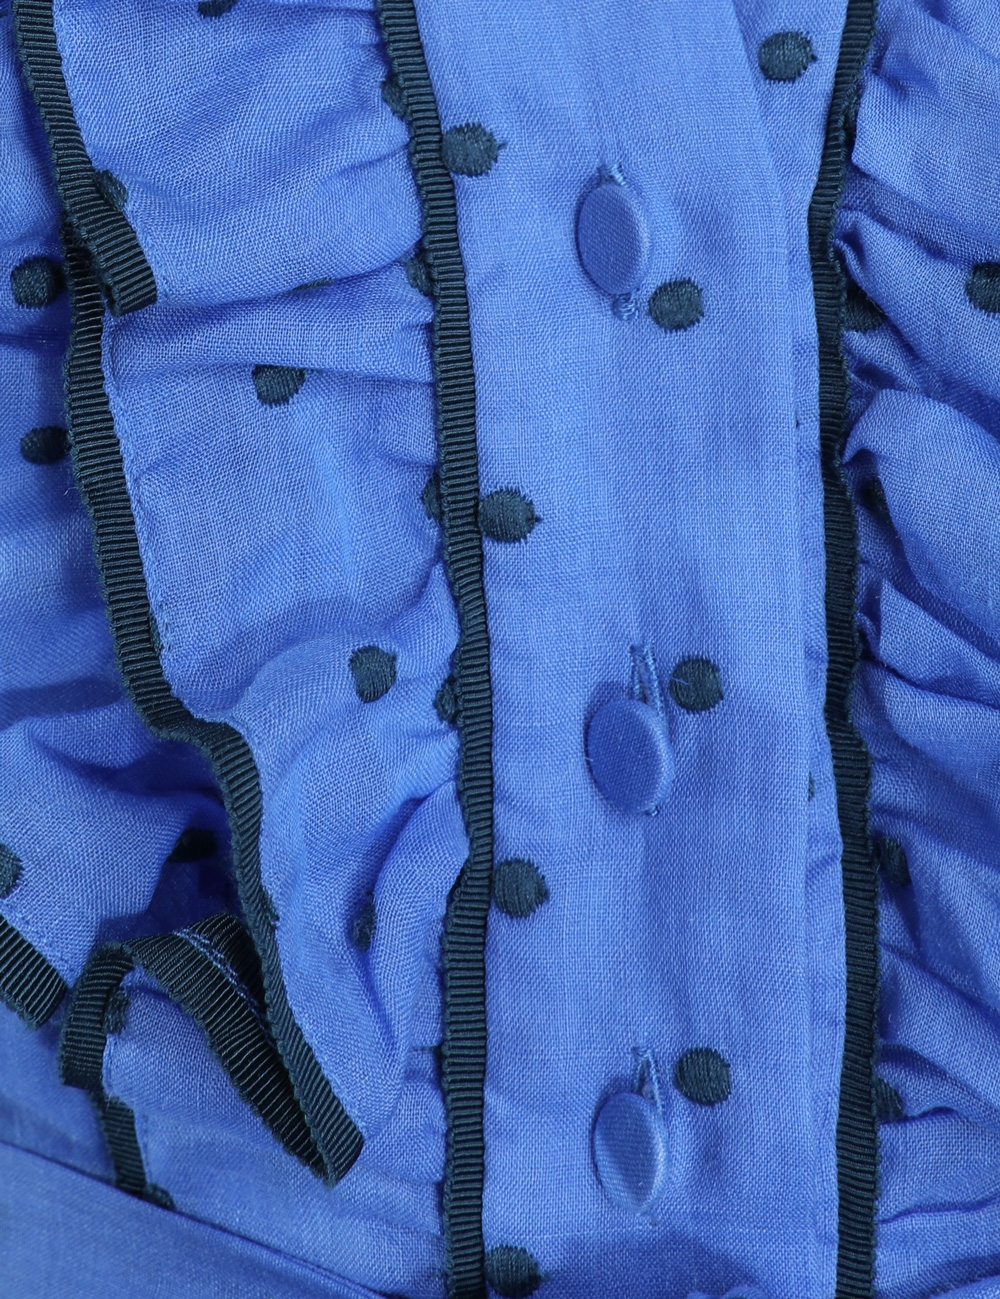 b2ef7a1bf7b3fe Moncur Ruffle Shirt Dress